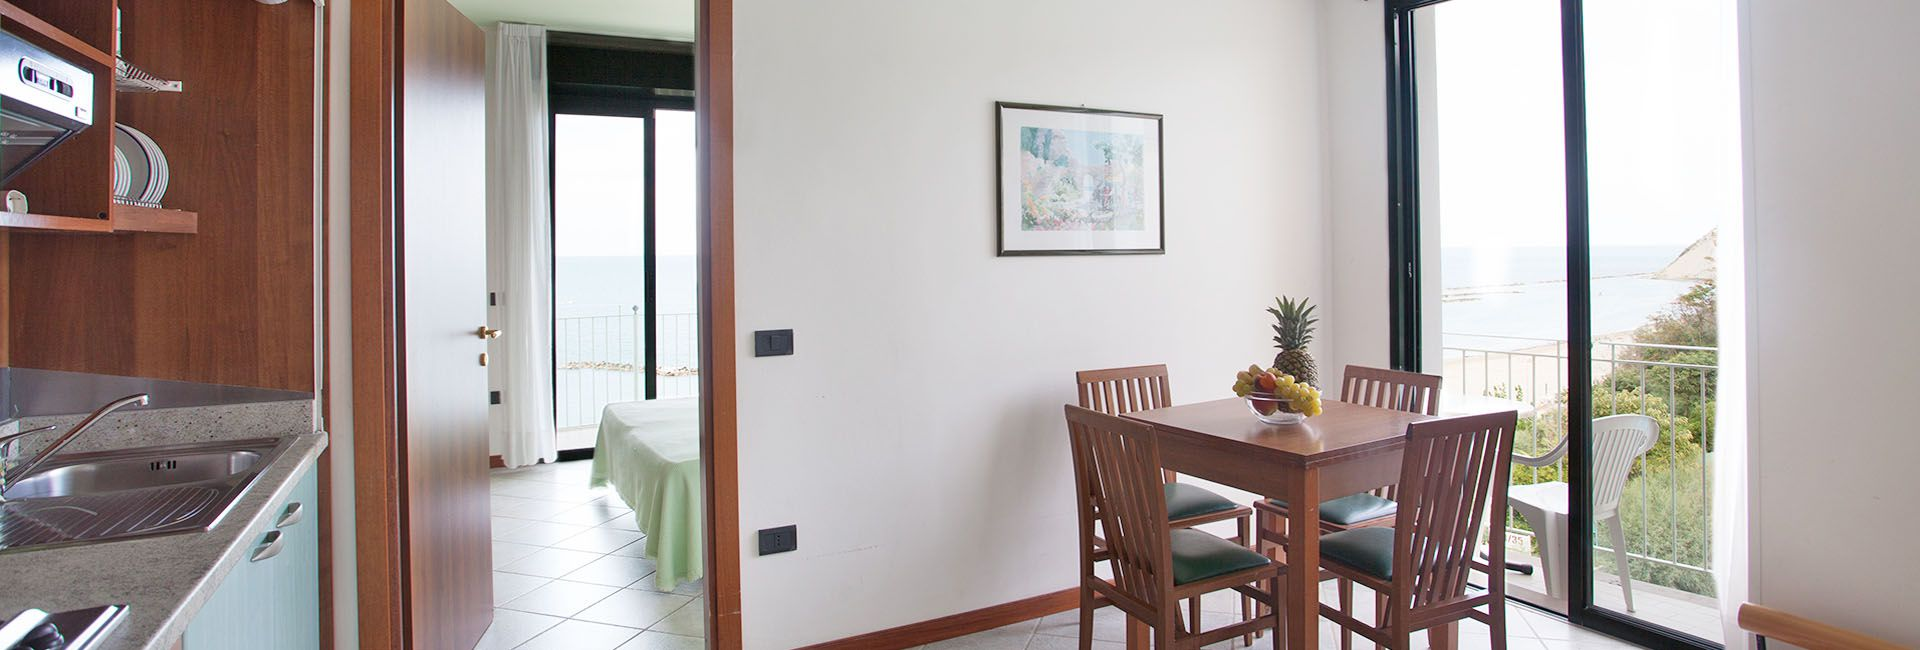 Residence hotel villamare gabicce mare hotel gabicce mare for Appartamenti gabicce mare